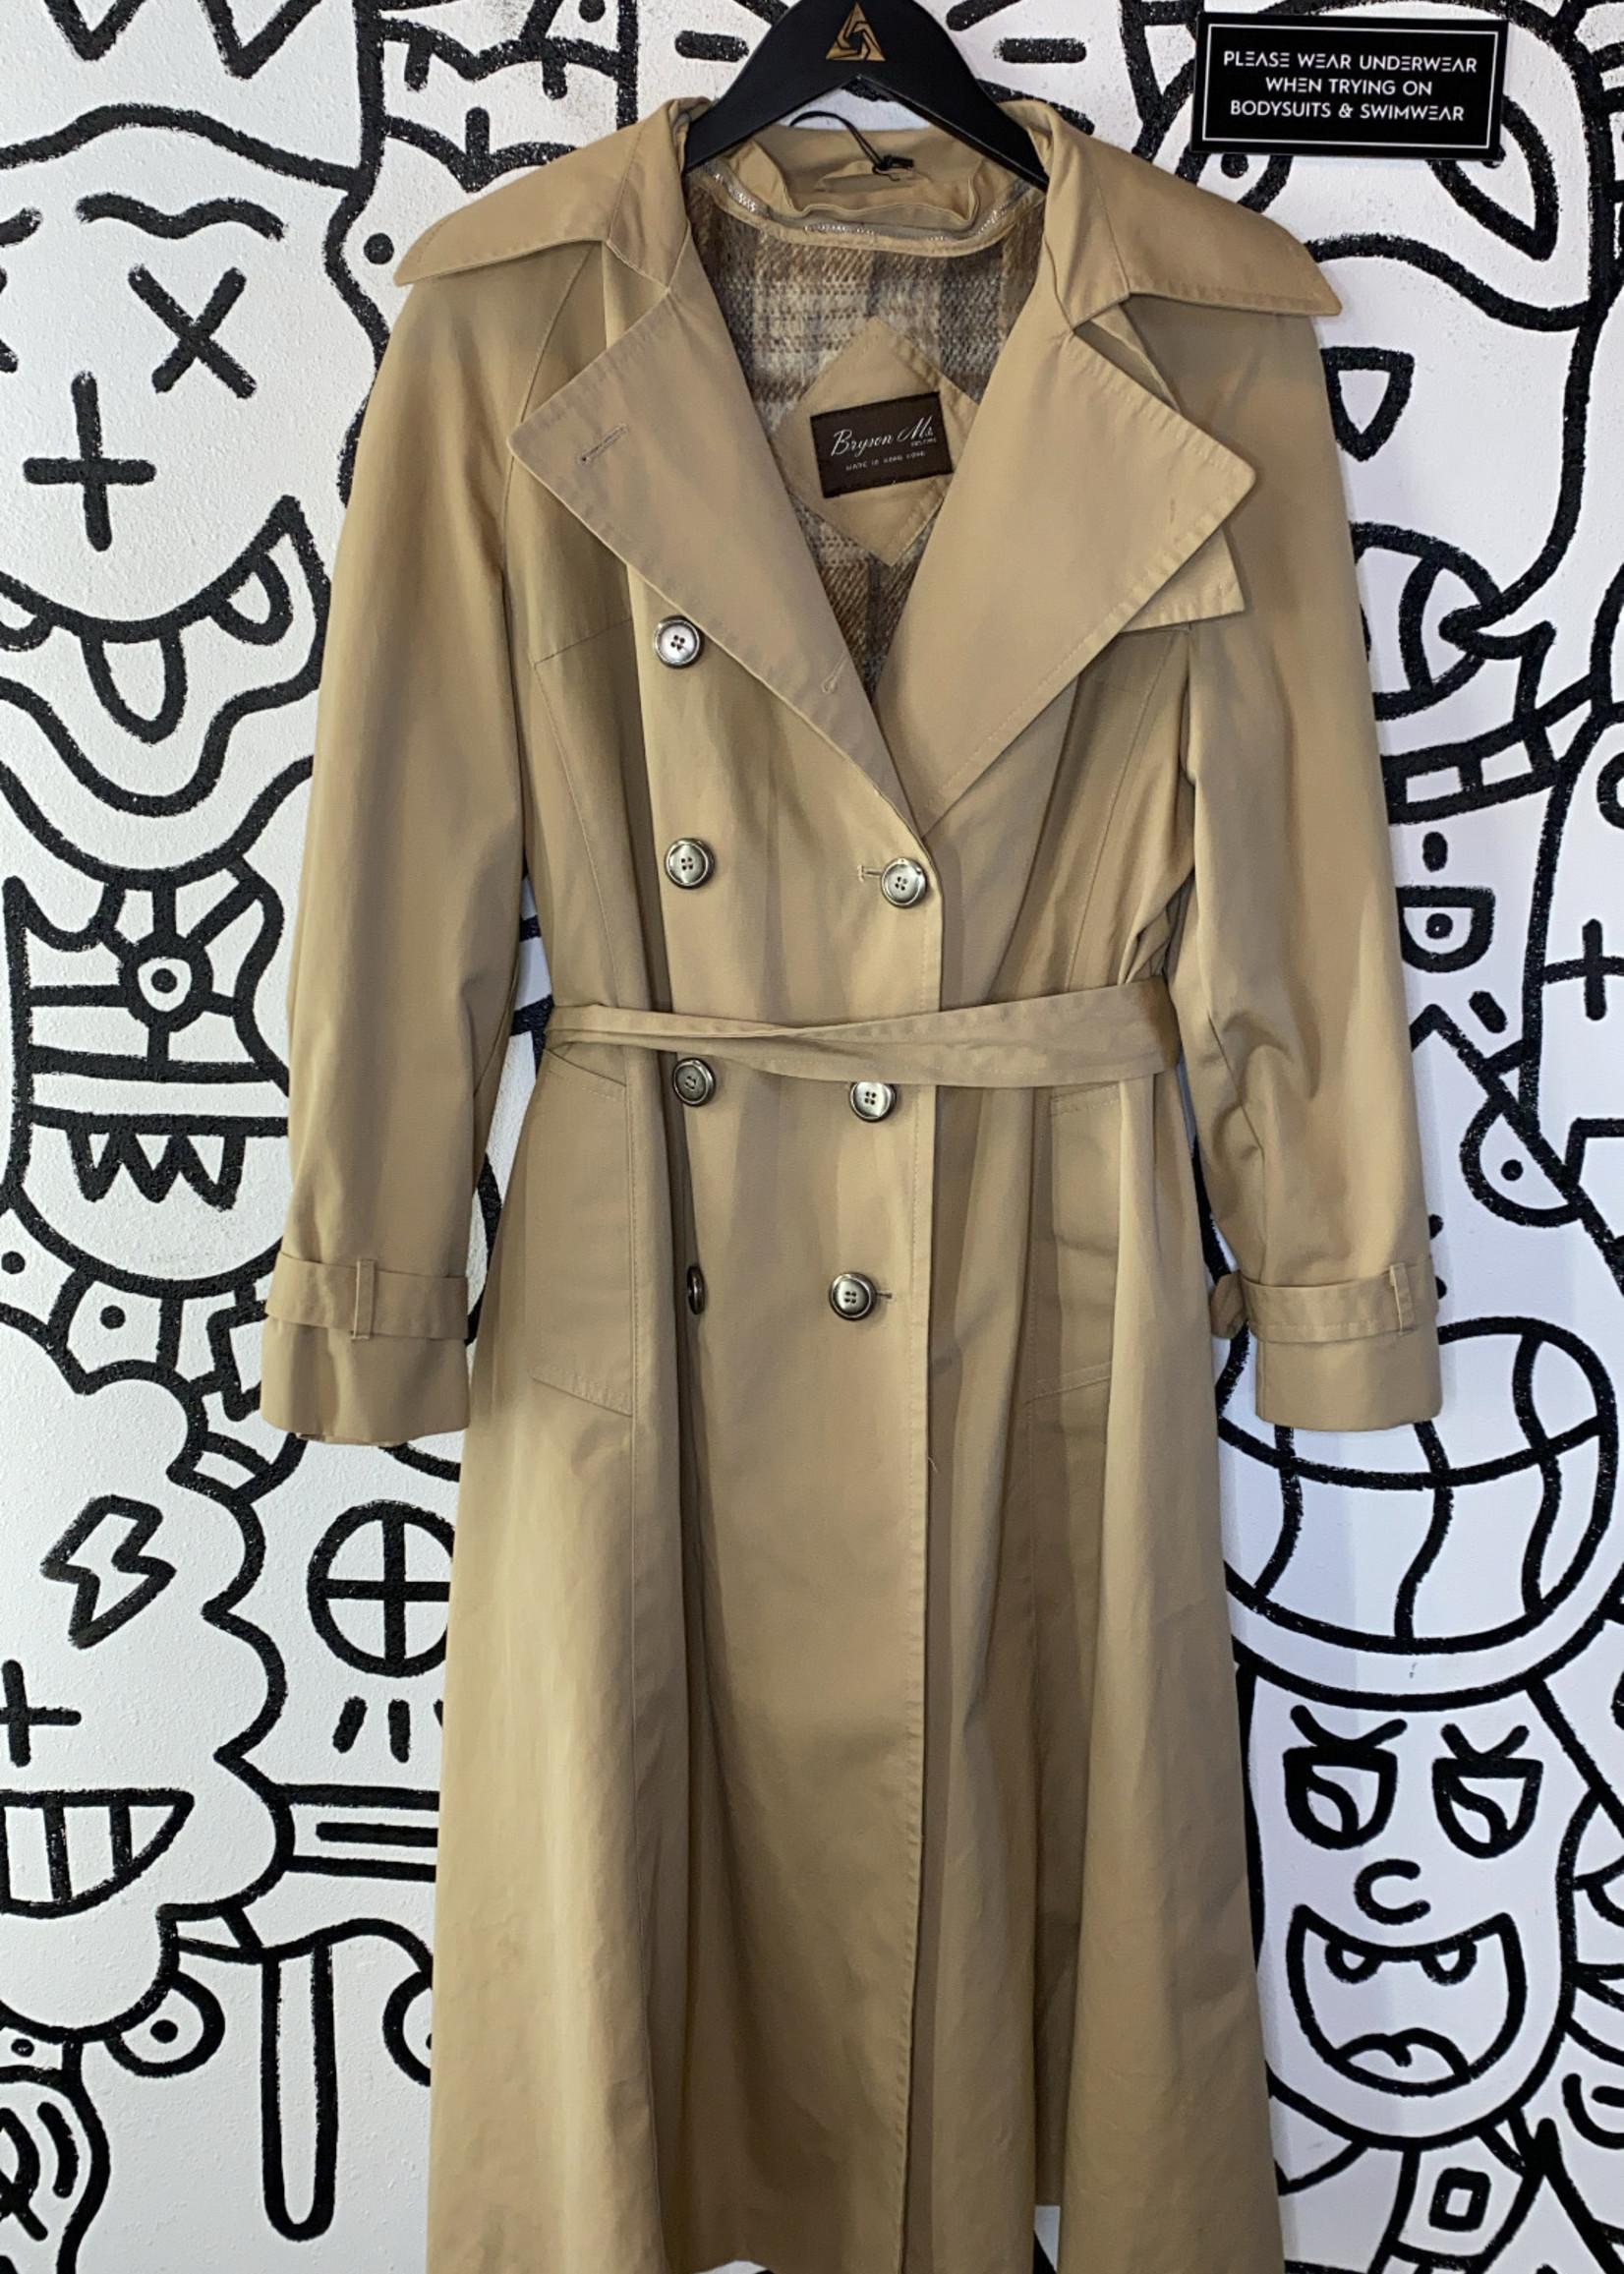 Bryson Ms. Vintage Beige Trench Coat L